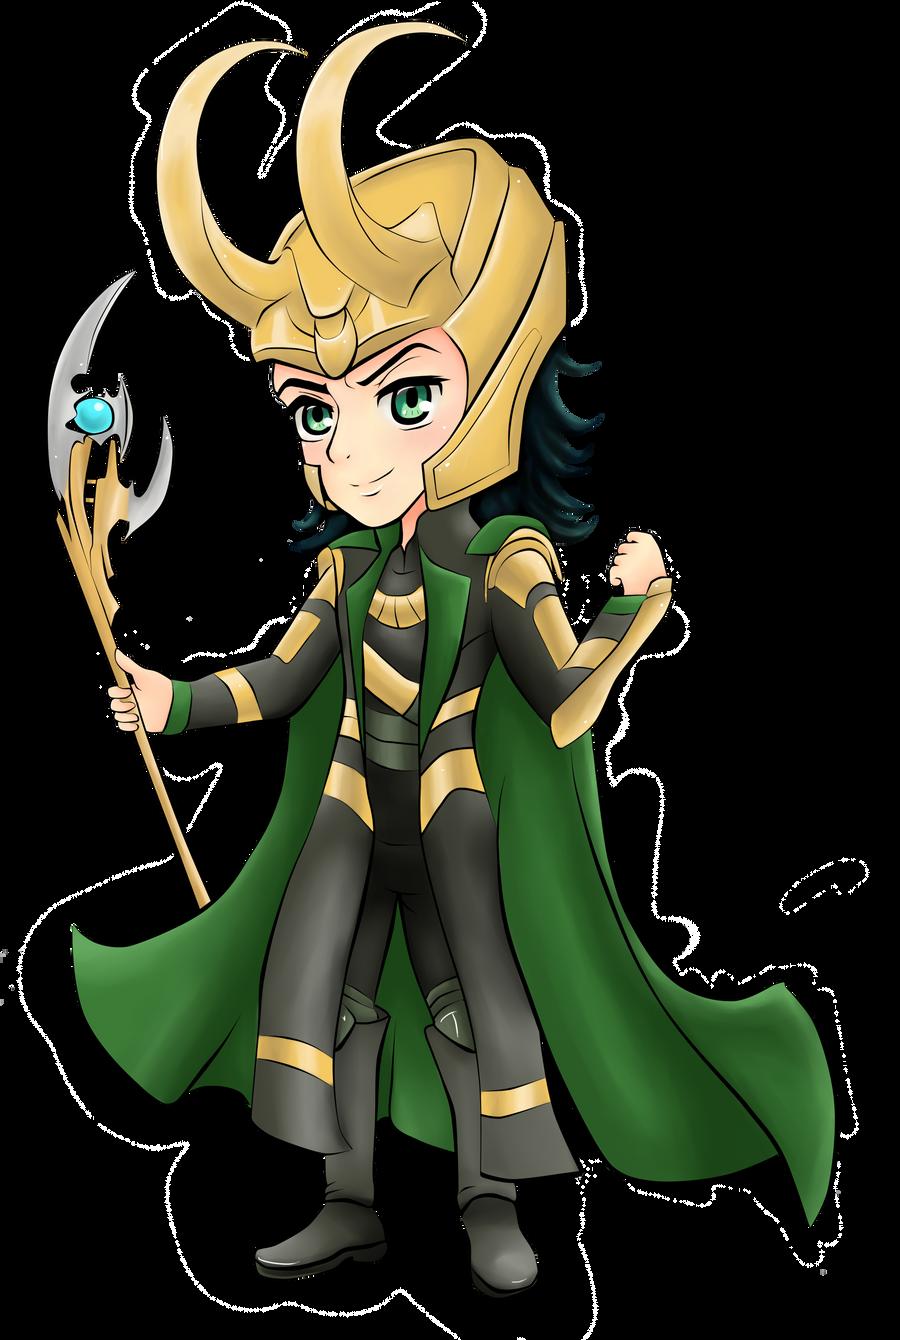 Loki - Avengers by twillis on DeviantArt